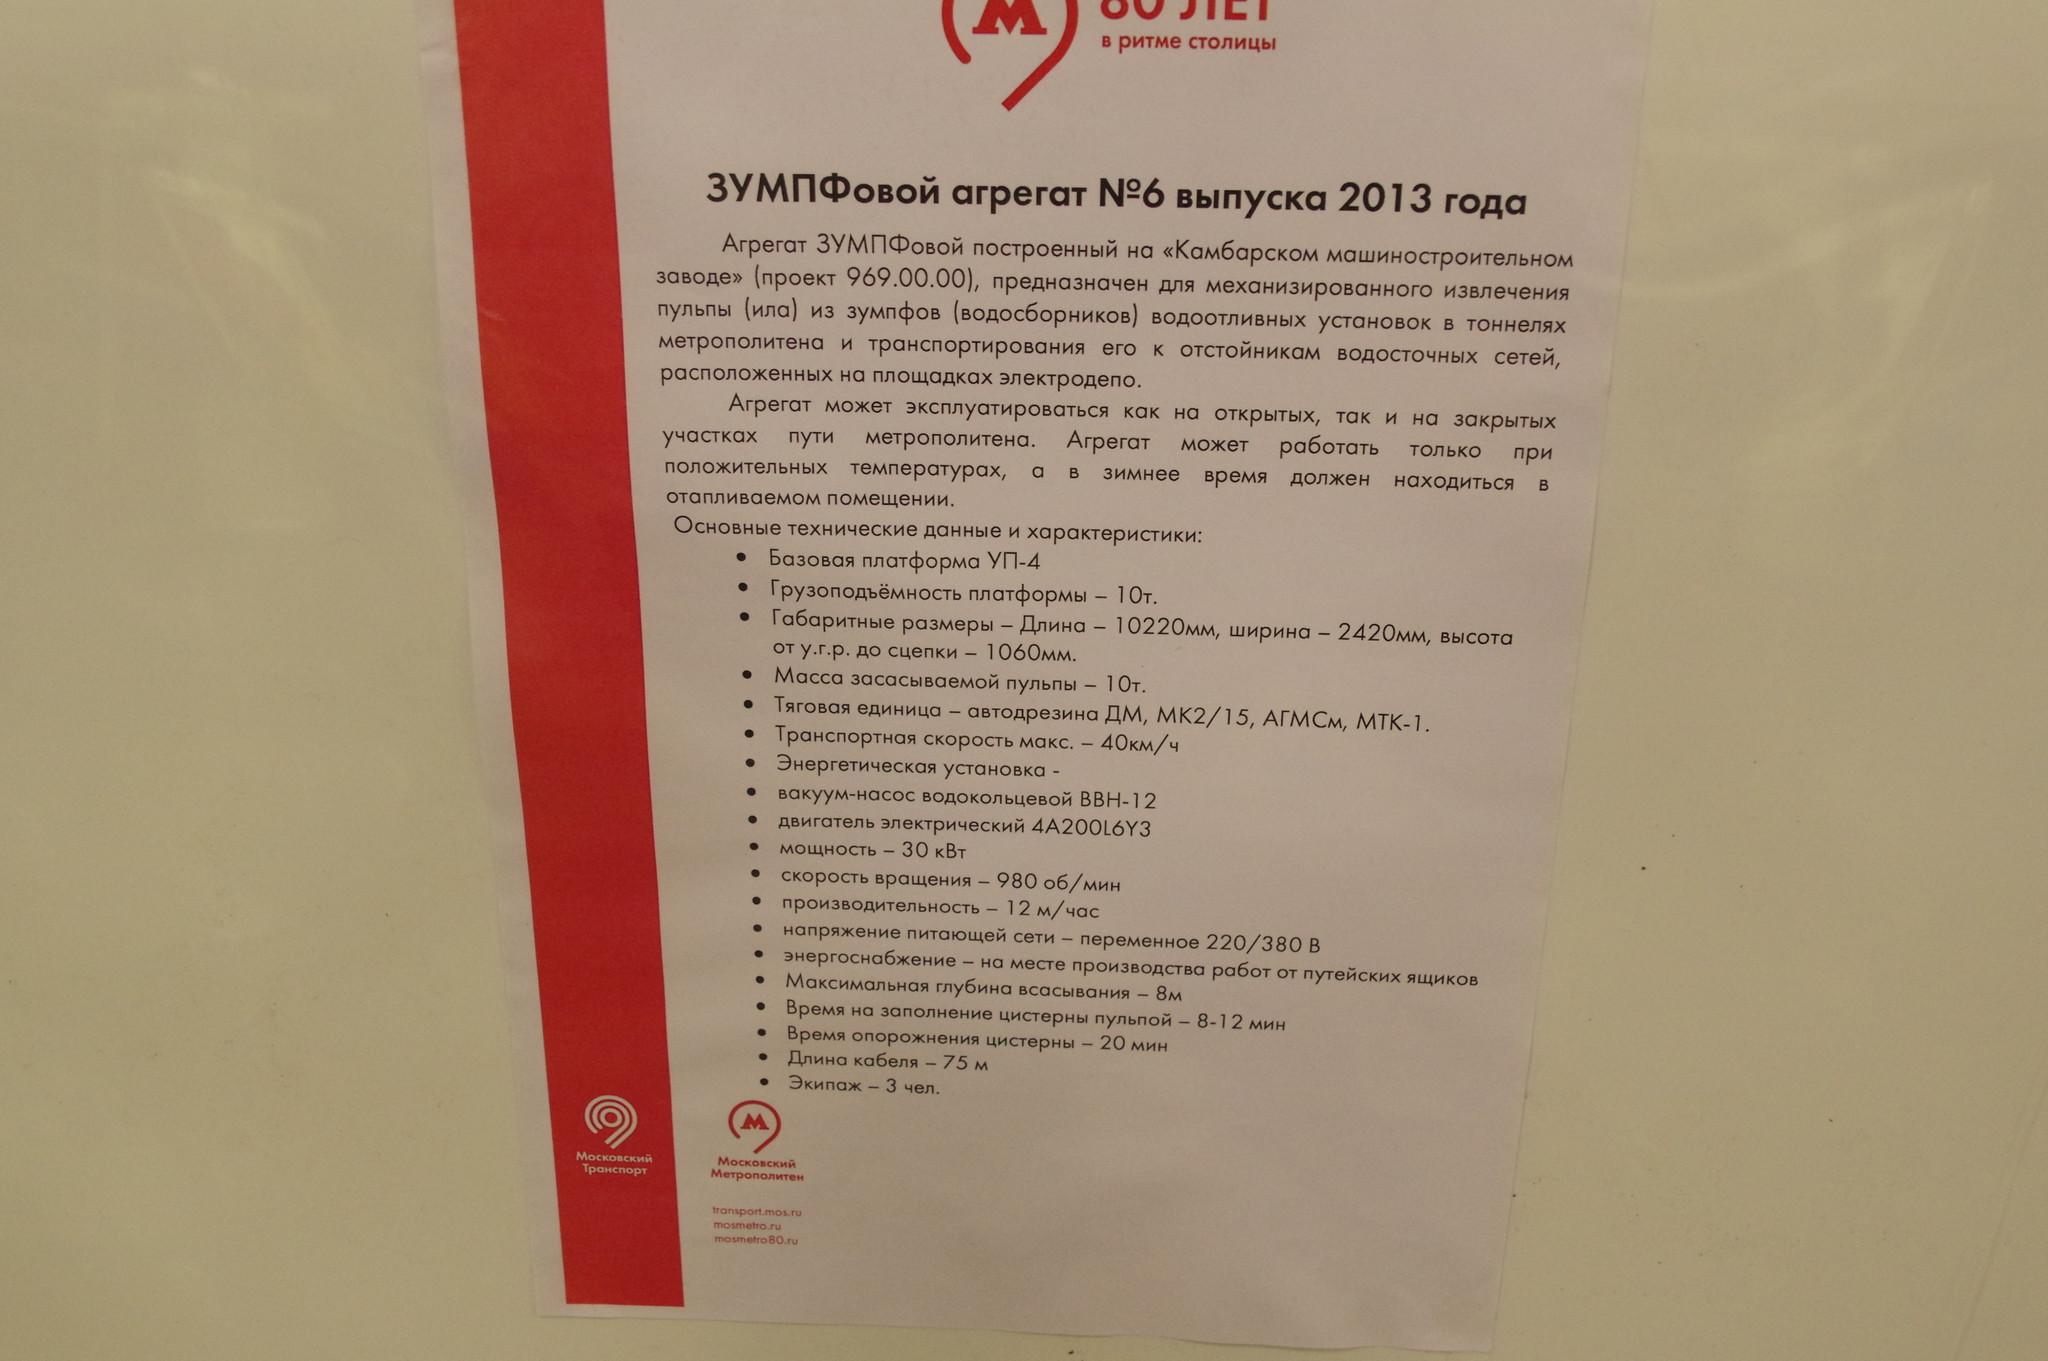 ЗУМПФовый агрегат № 6 (2013 год)